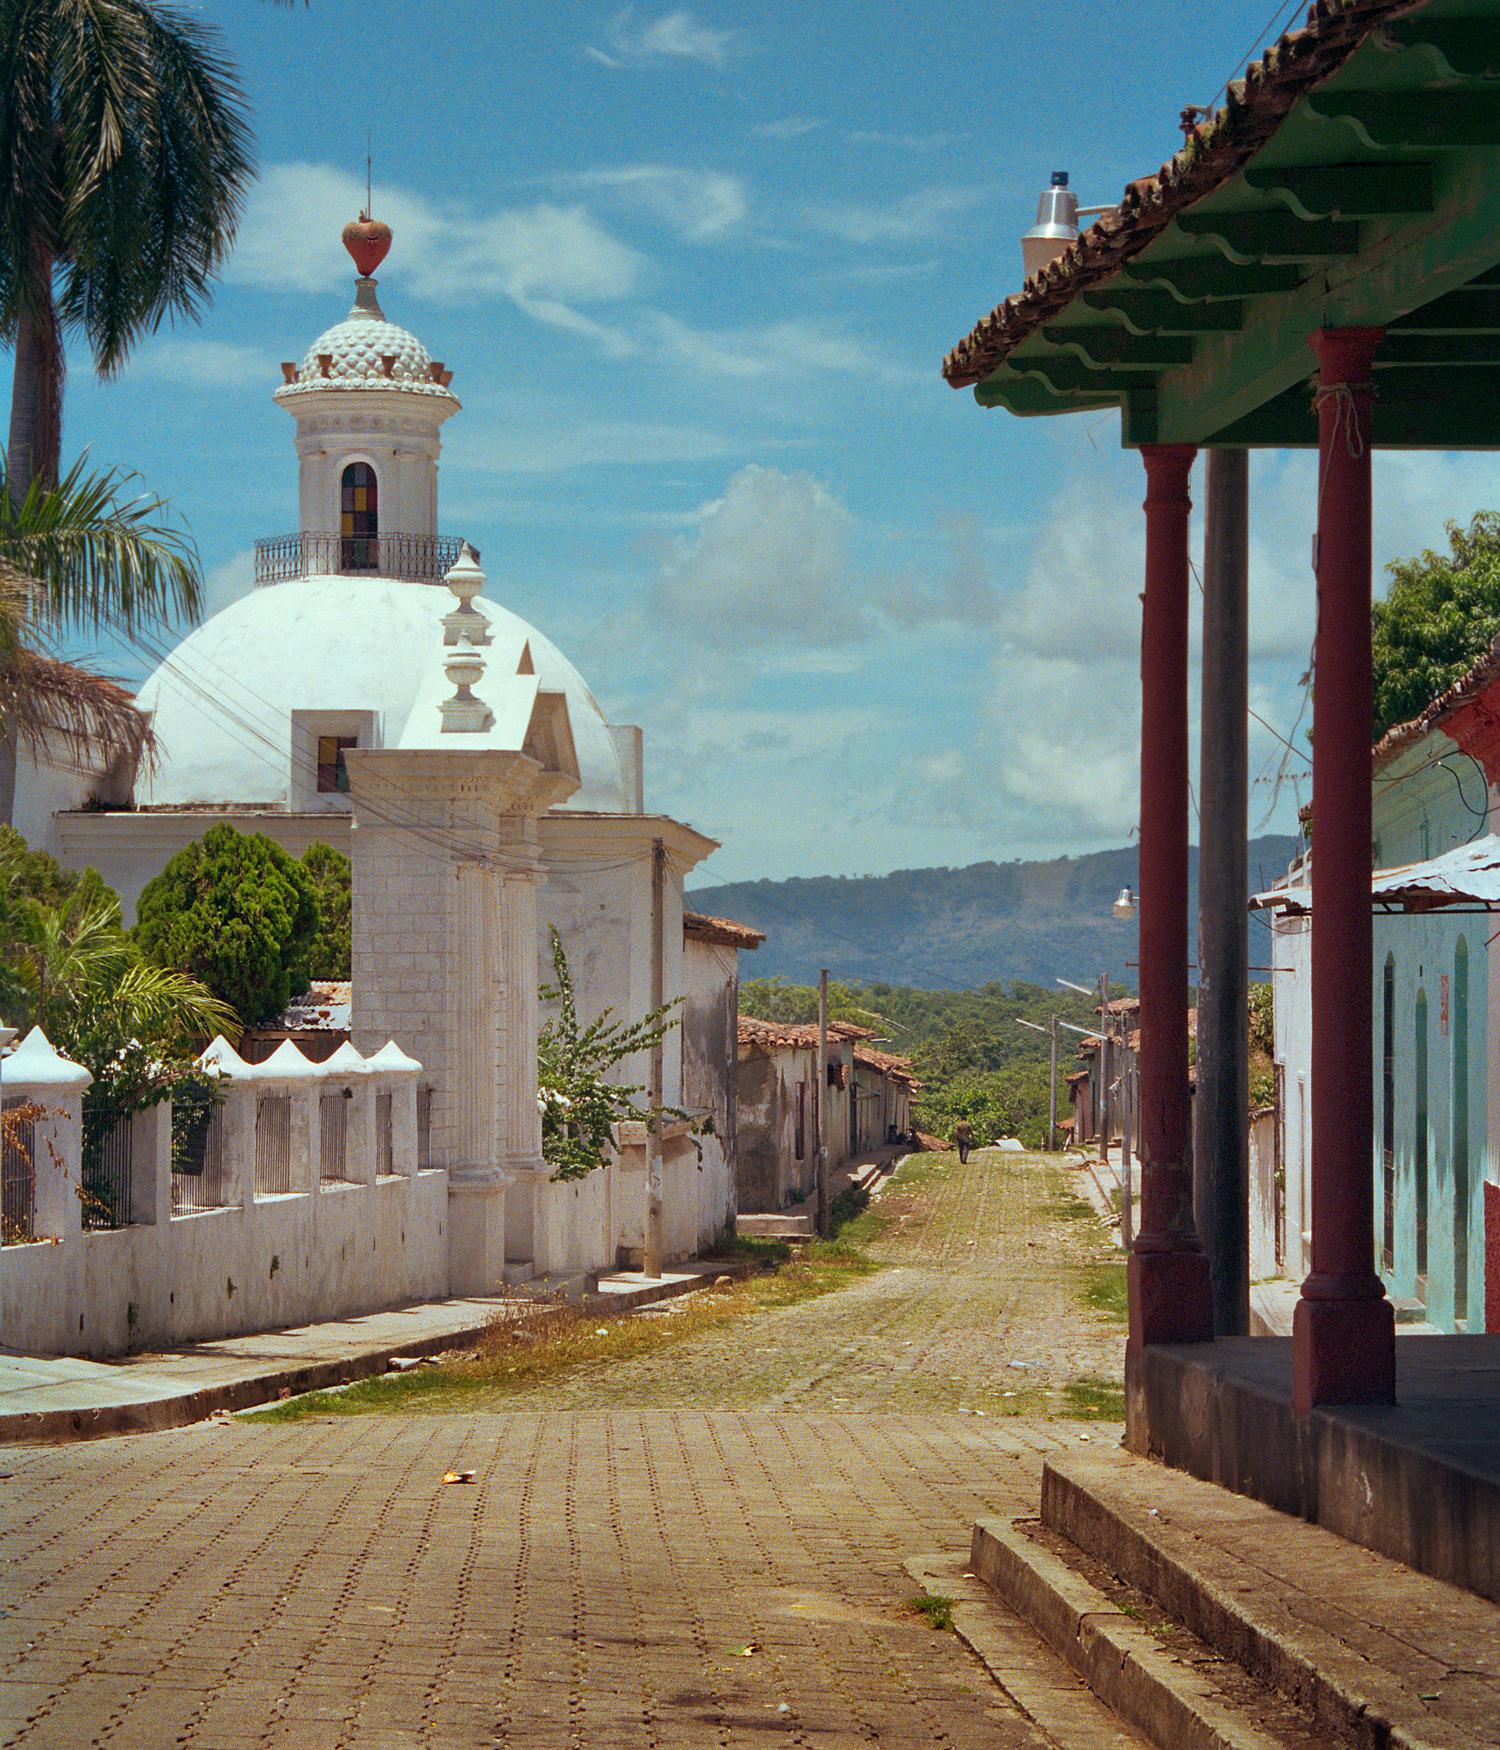 El Salvador, 1996